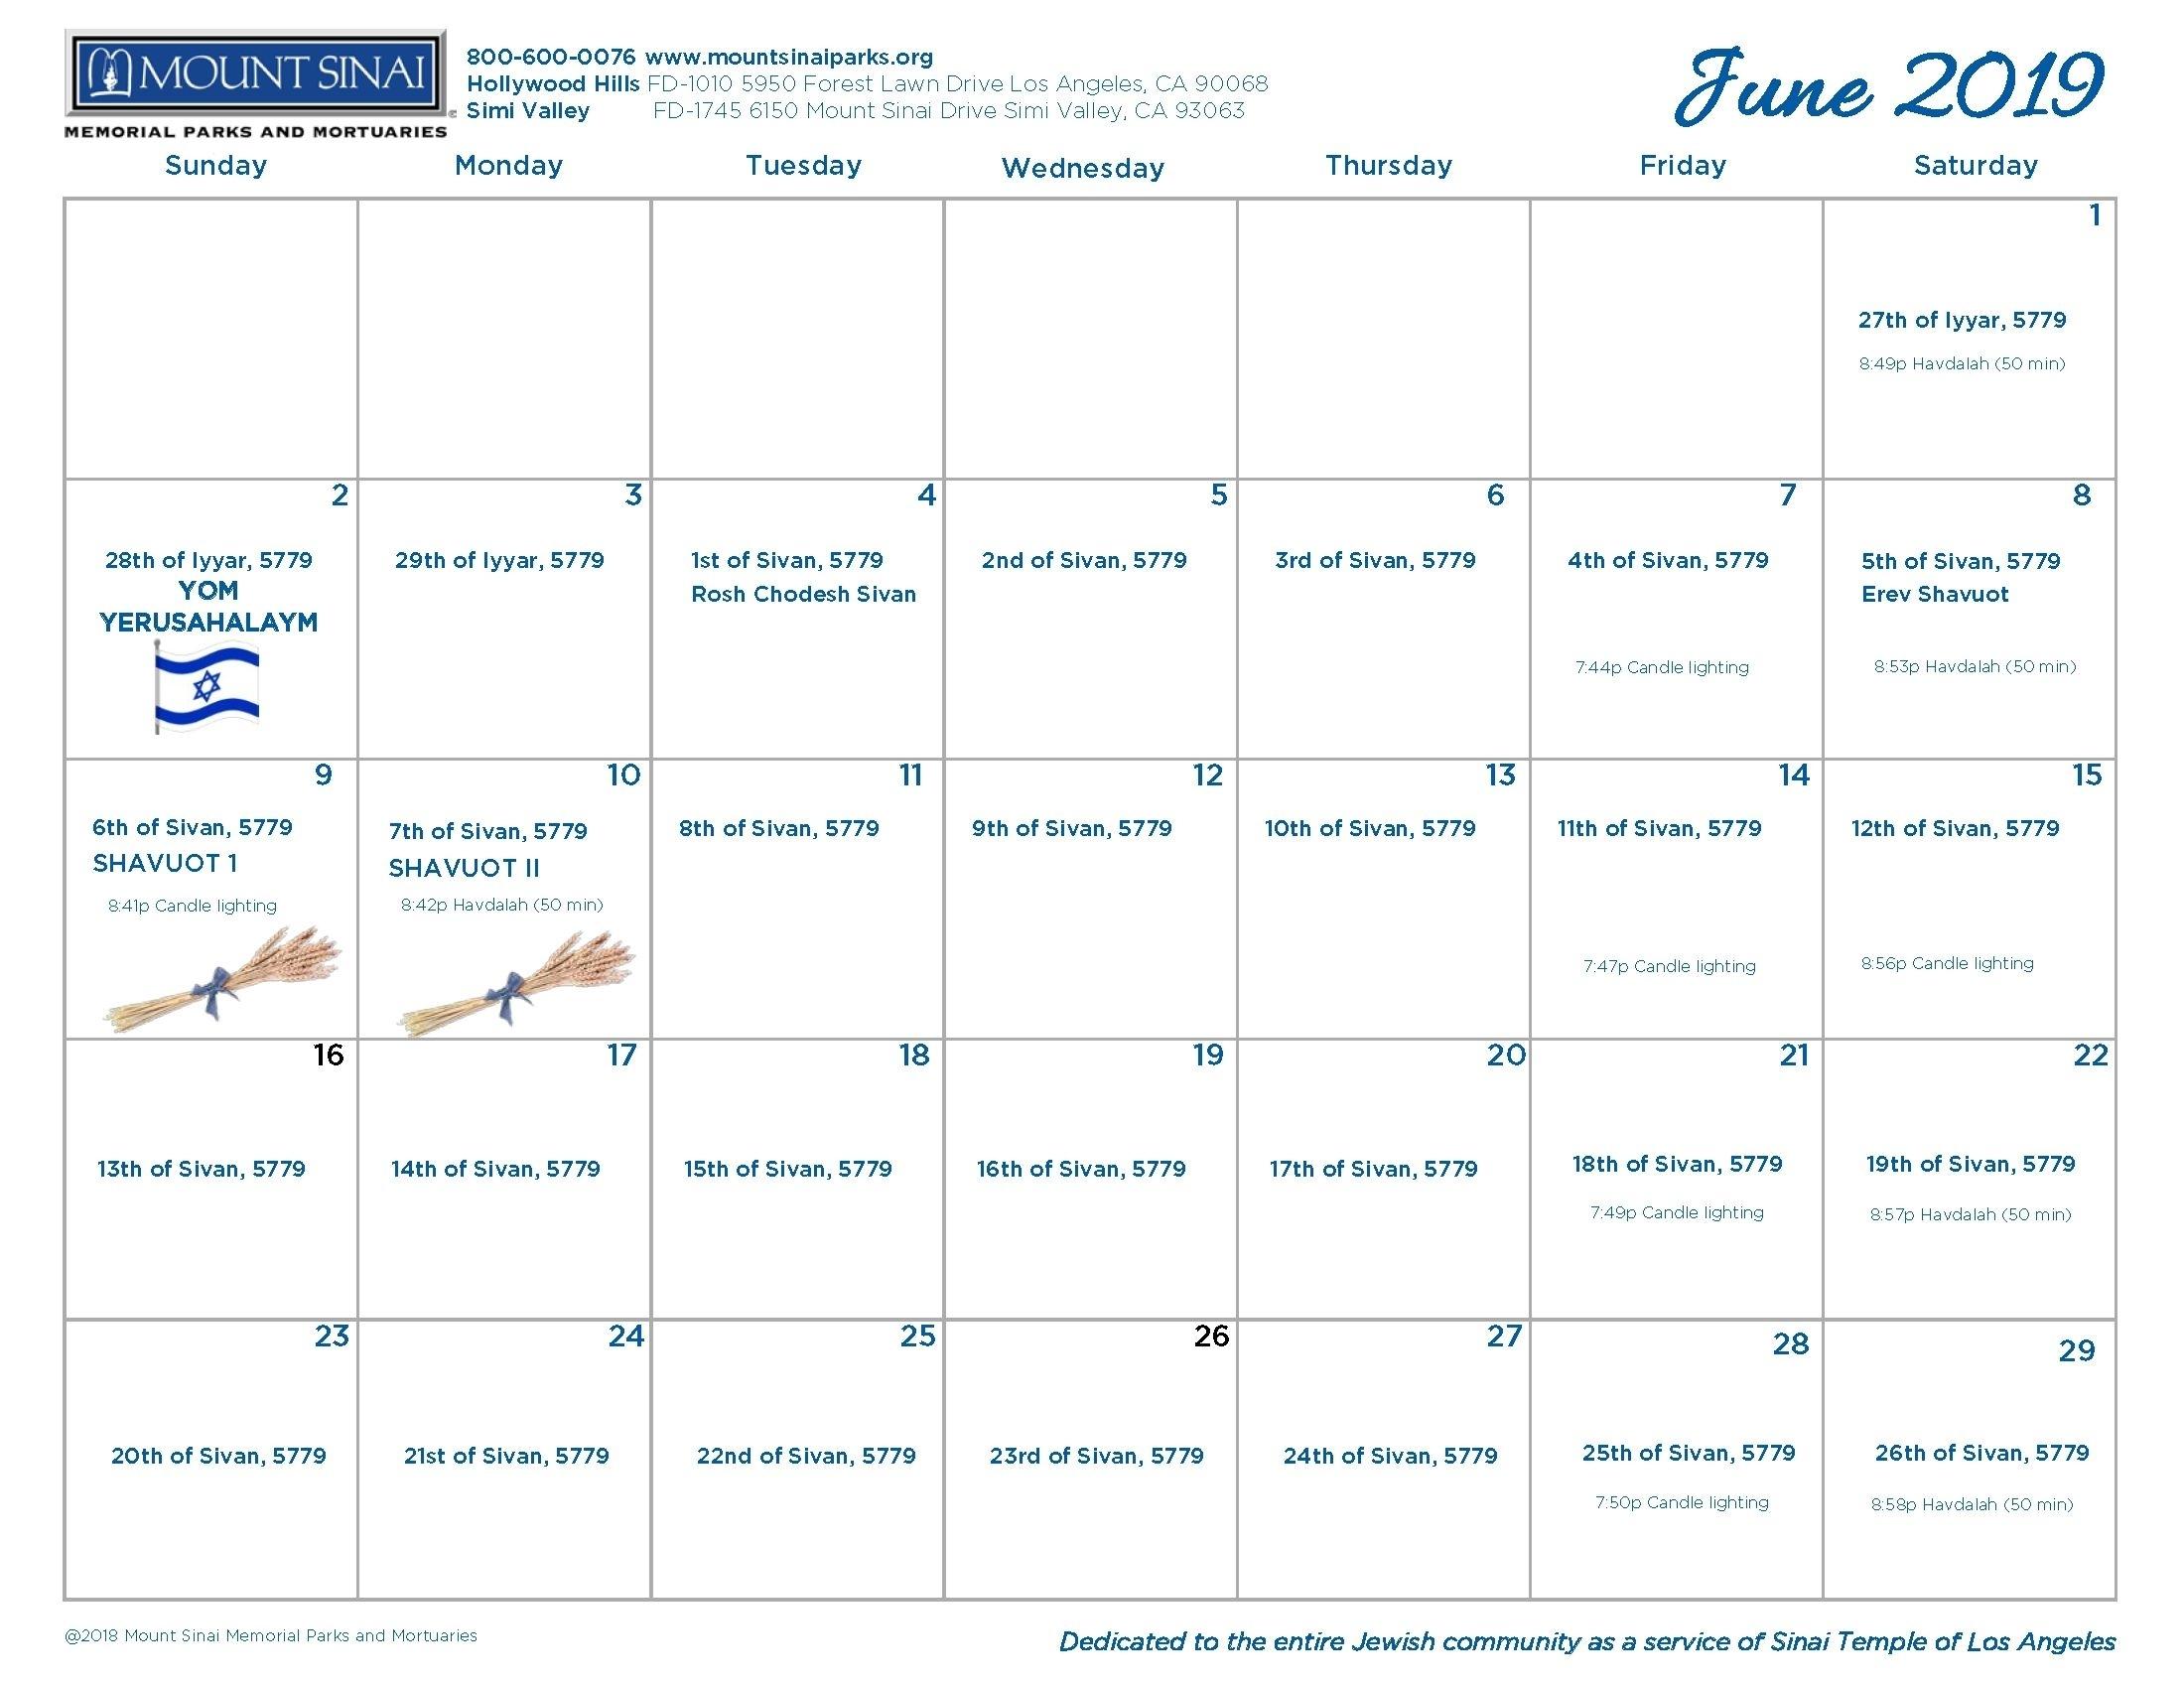 5779 Hebrew Calendar - Mount Sinai Memorial Parks And